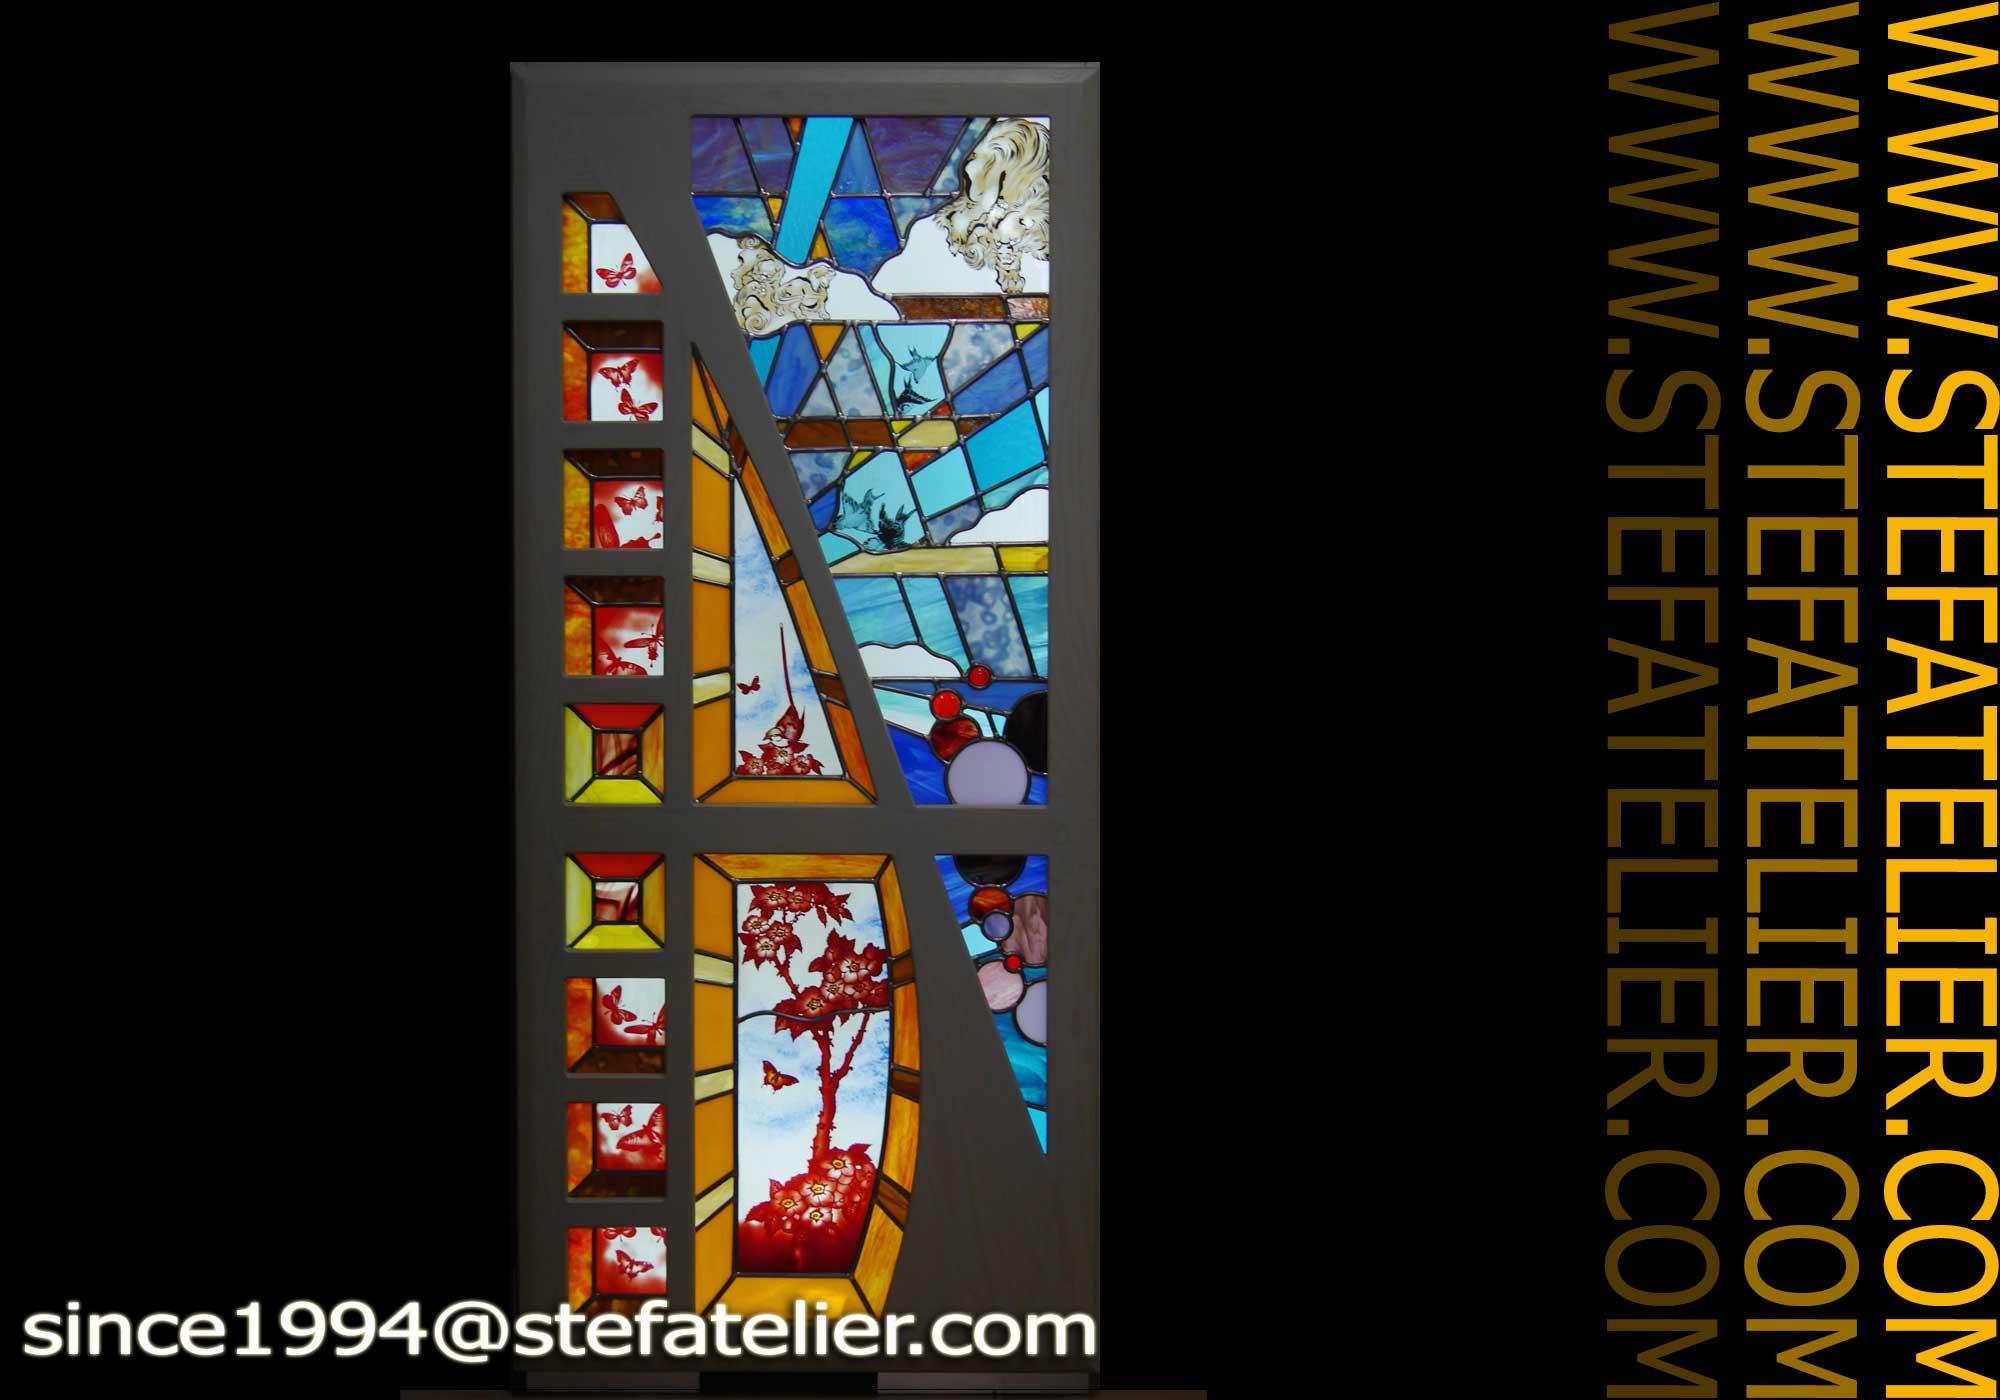 Vitrine aux vitraux meuble a stef atelier vitraux d art - Meuble tiffany ...